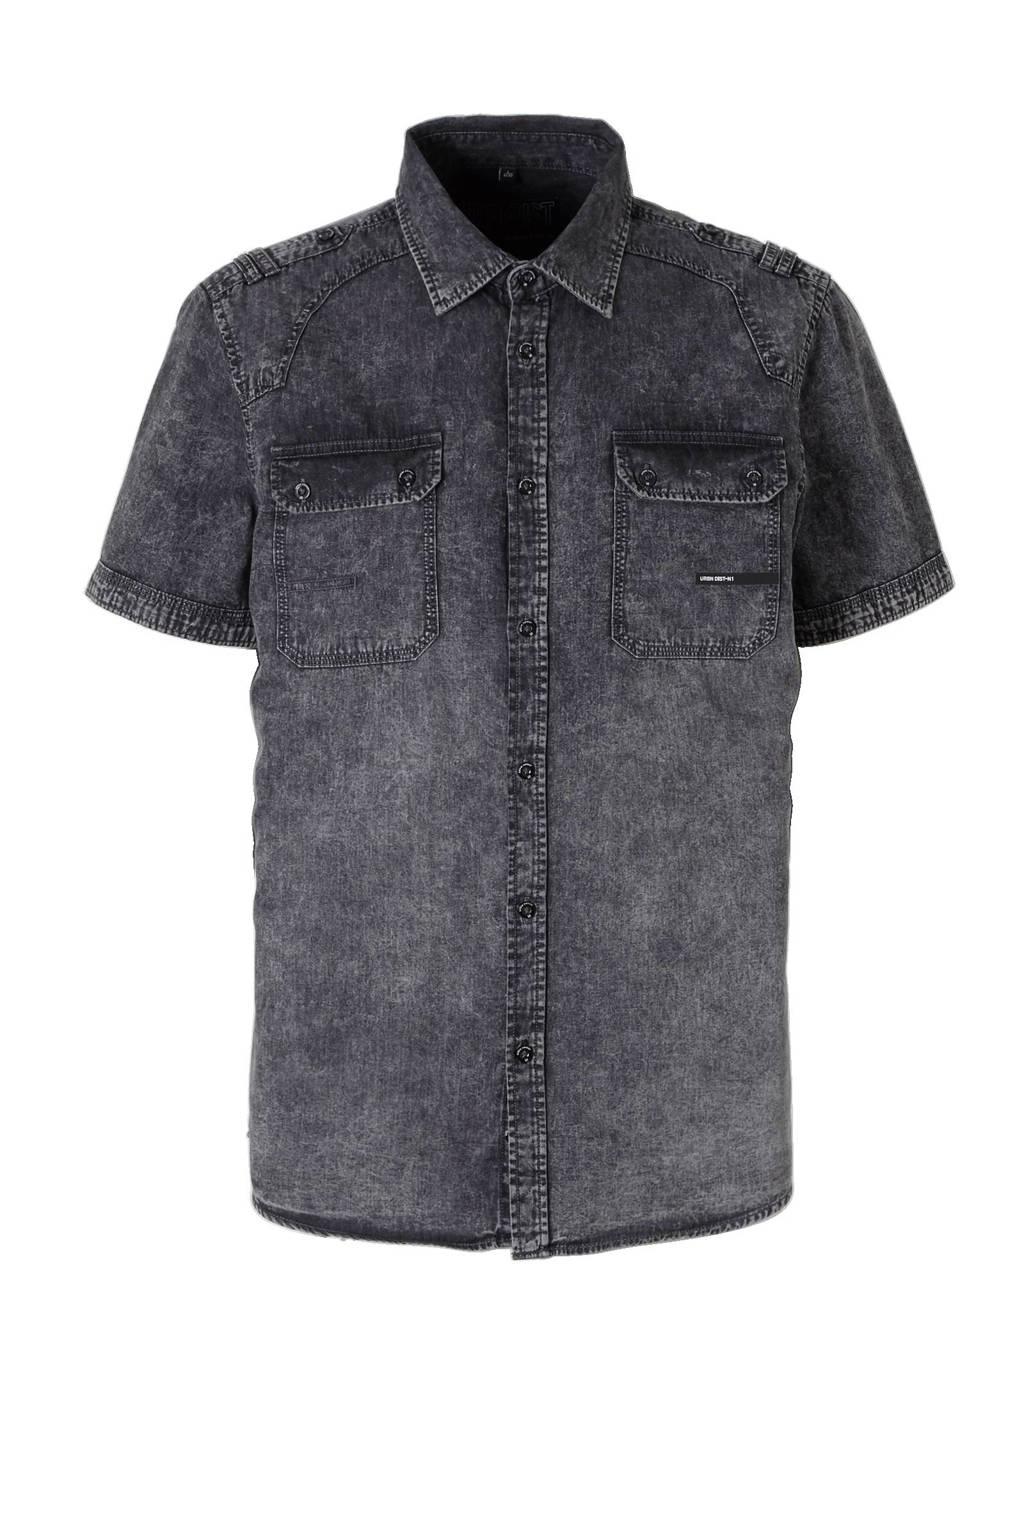 Donkergrijs Overhemd.C A Angelo Litrico Overhemd Wehkamp